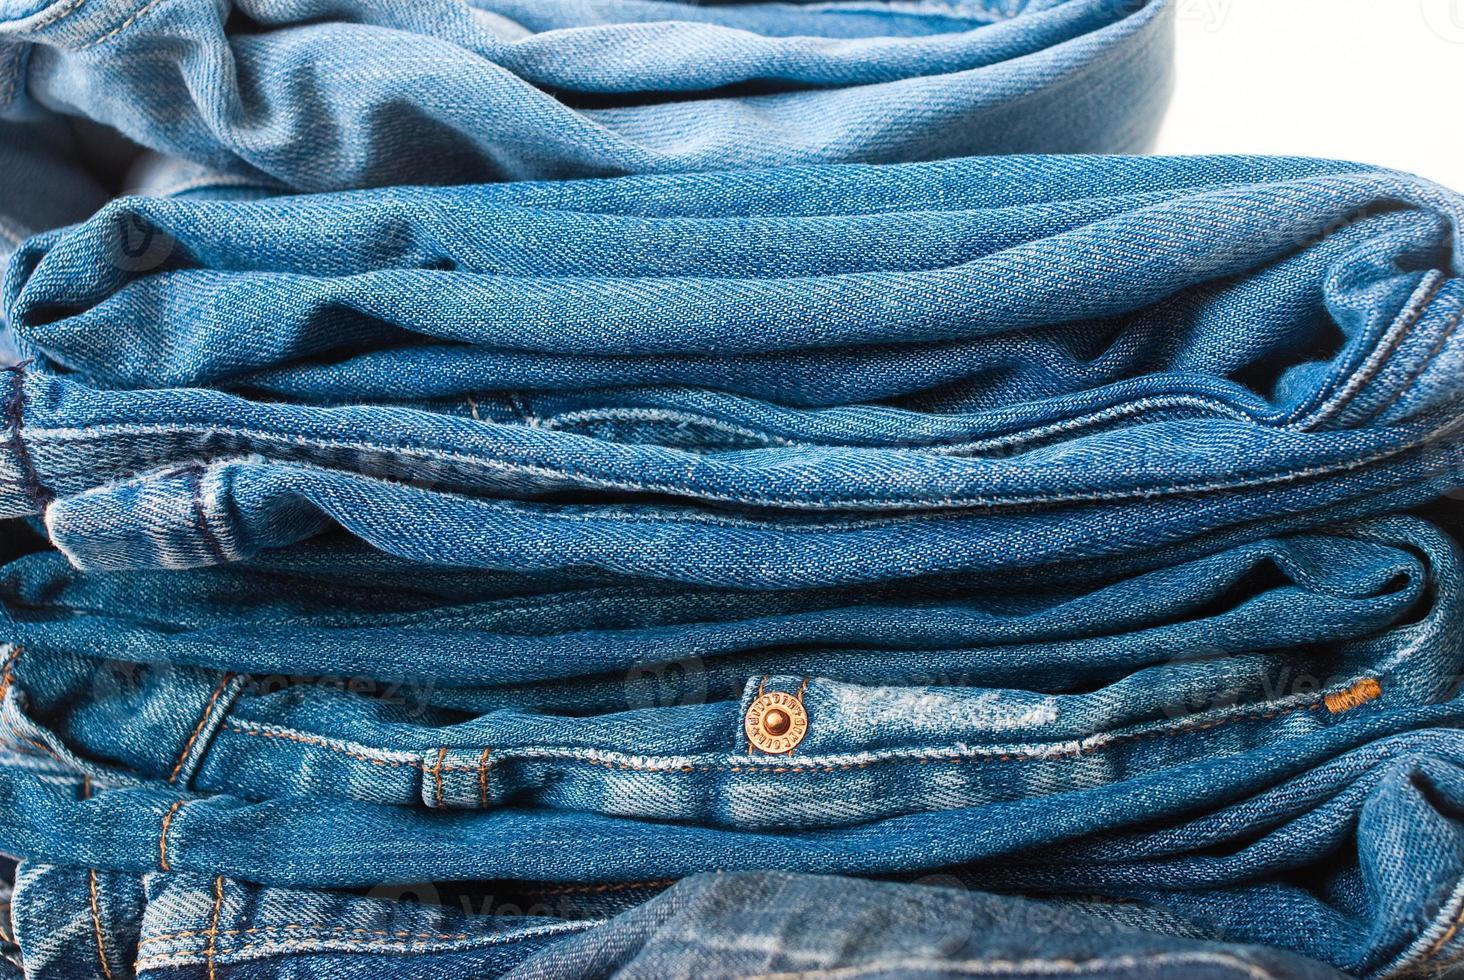 jeans impilati su uno sfondo bianco - studio shot foto